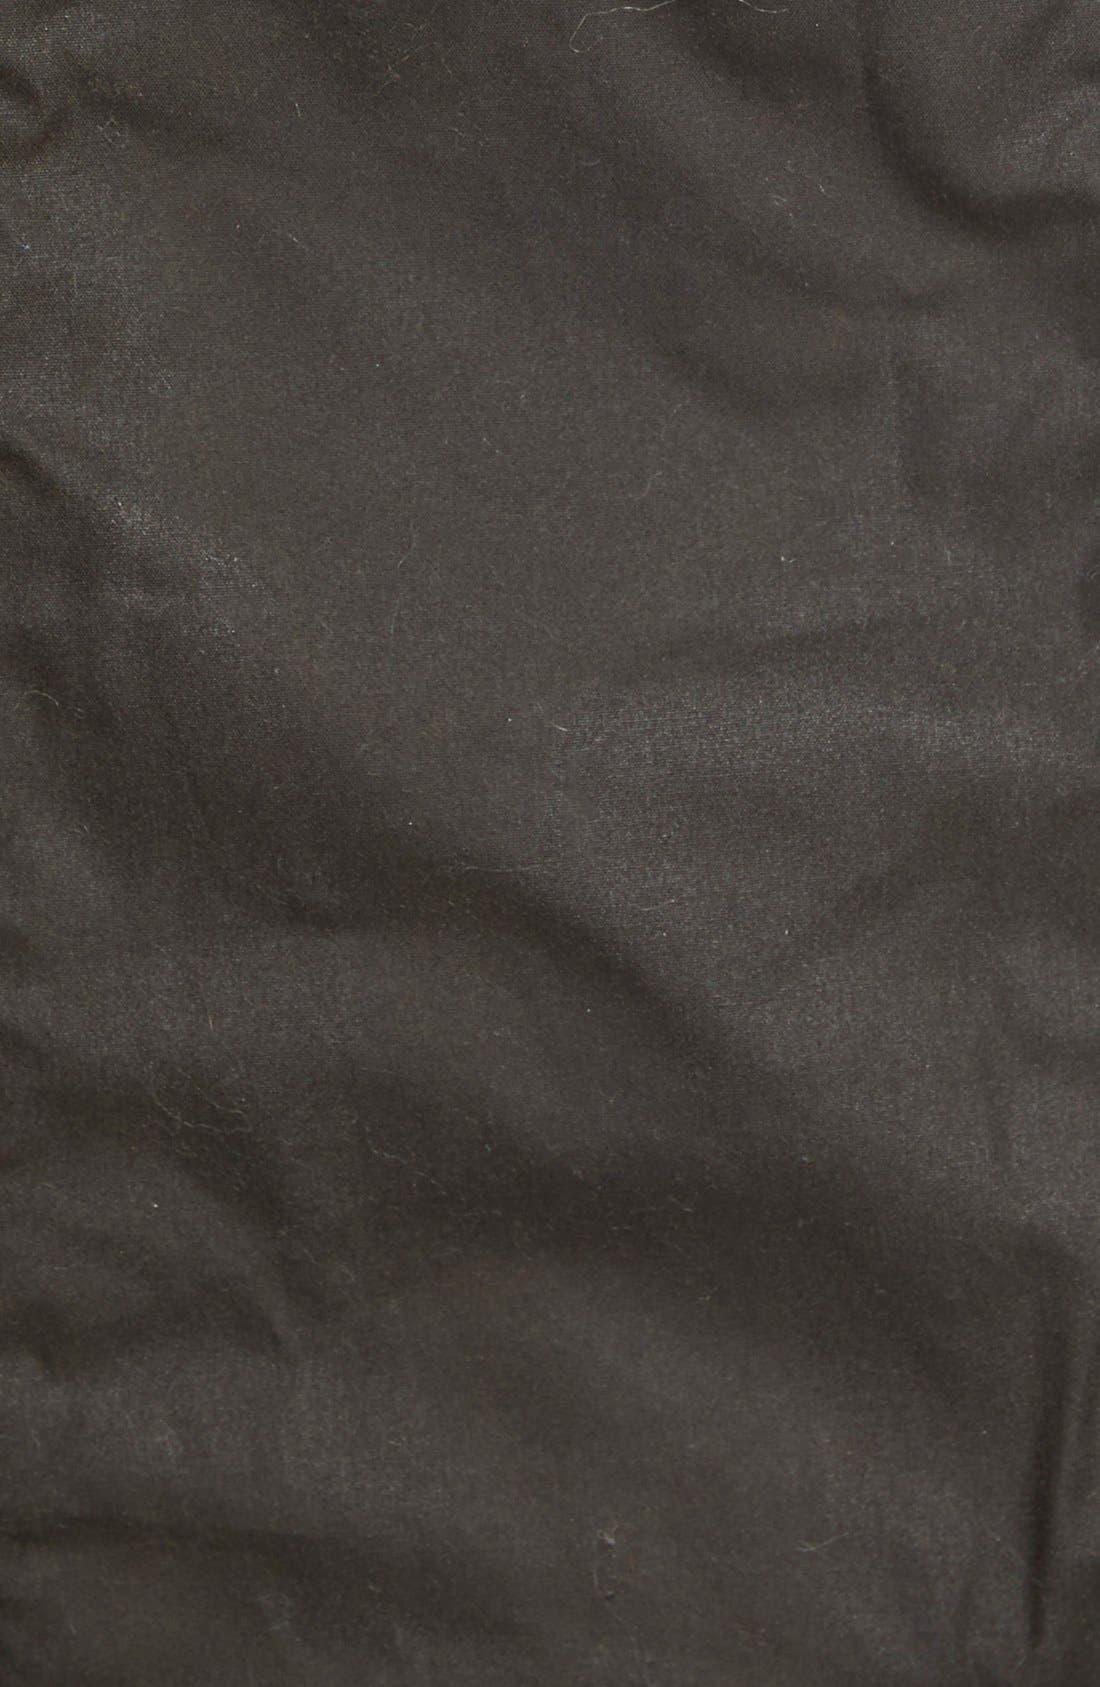 Alternate Image 3  - Barbour 'Bower' Waxed CottonJacket